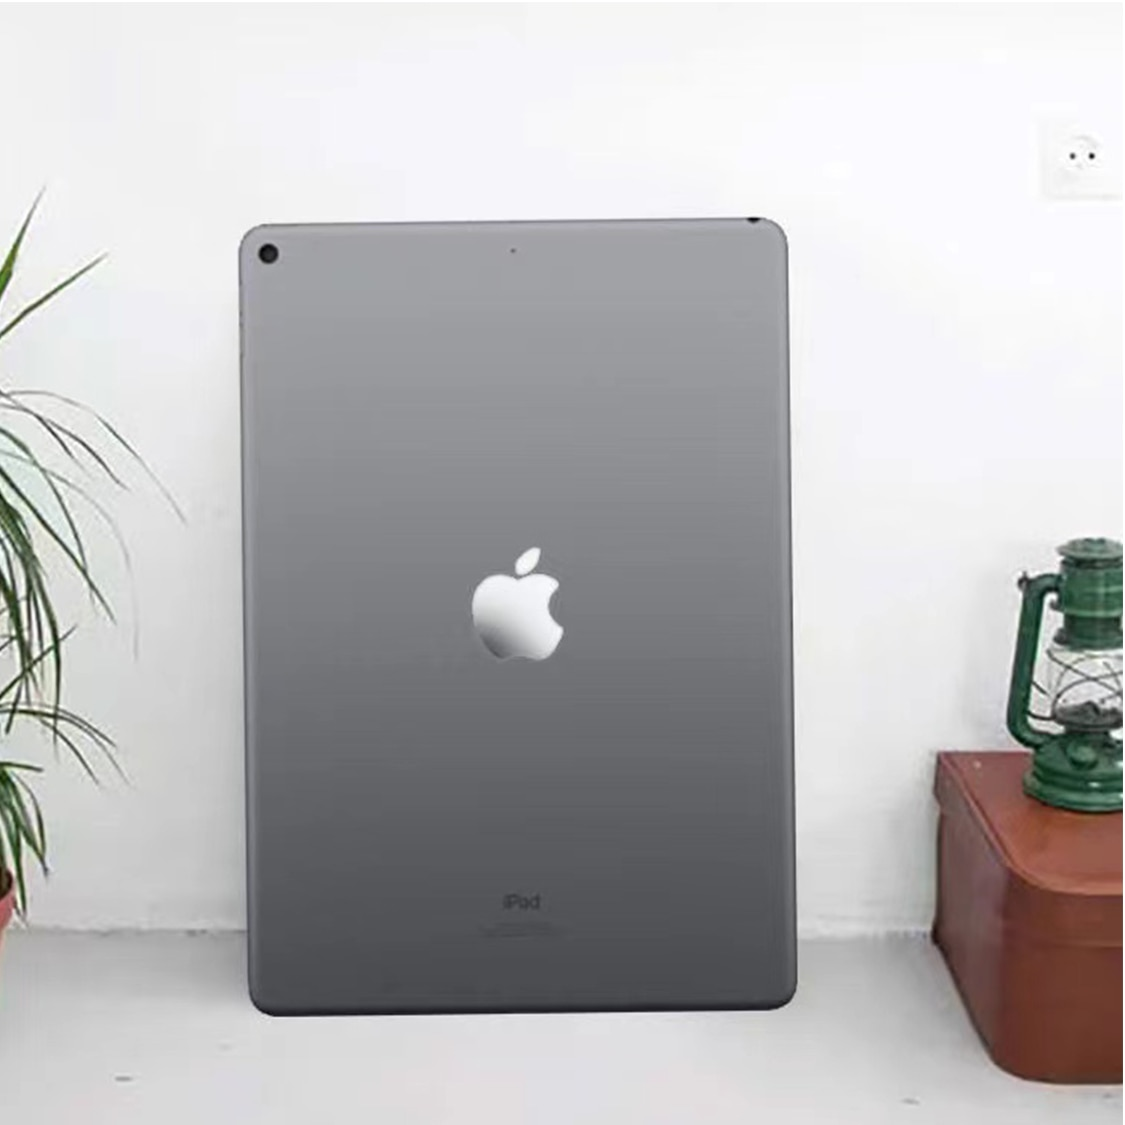 Apple ipad mini 1st 7.9 polegada 2012 90% original novo usado 16/32/64gb preto prata ios tablet wifi versão duplo-core a5 5mp